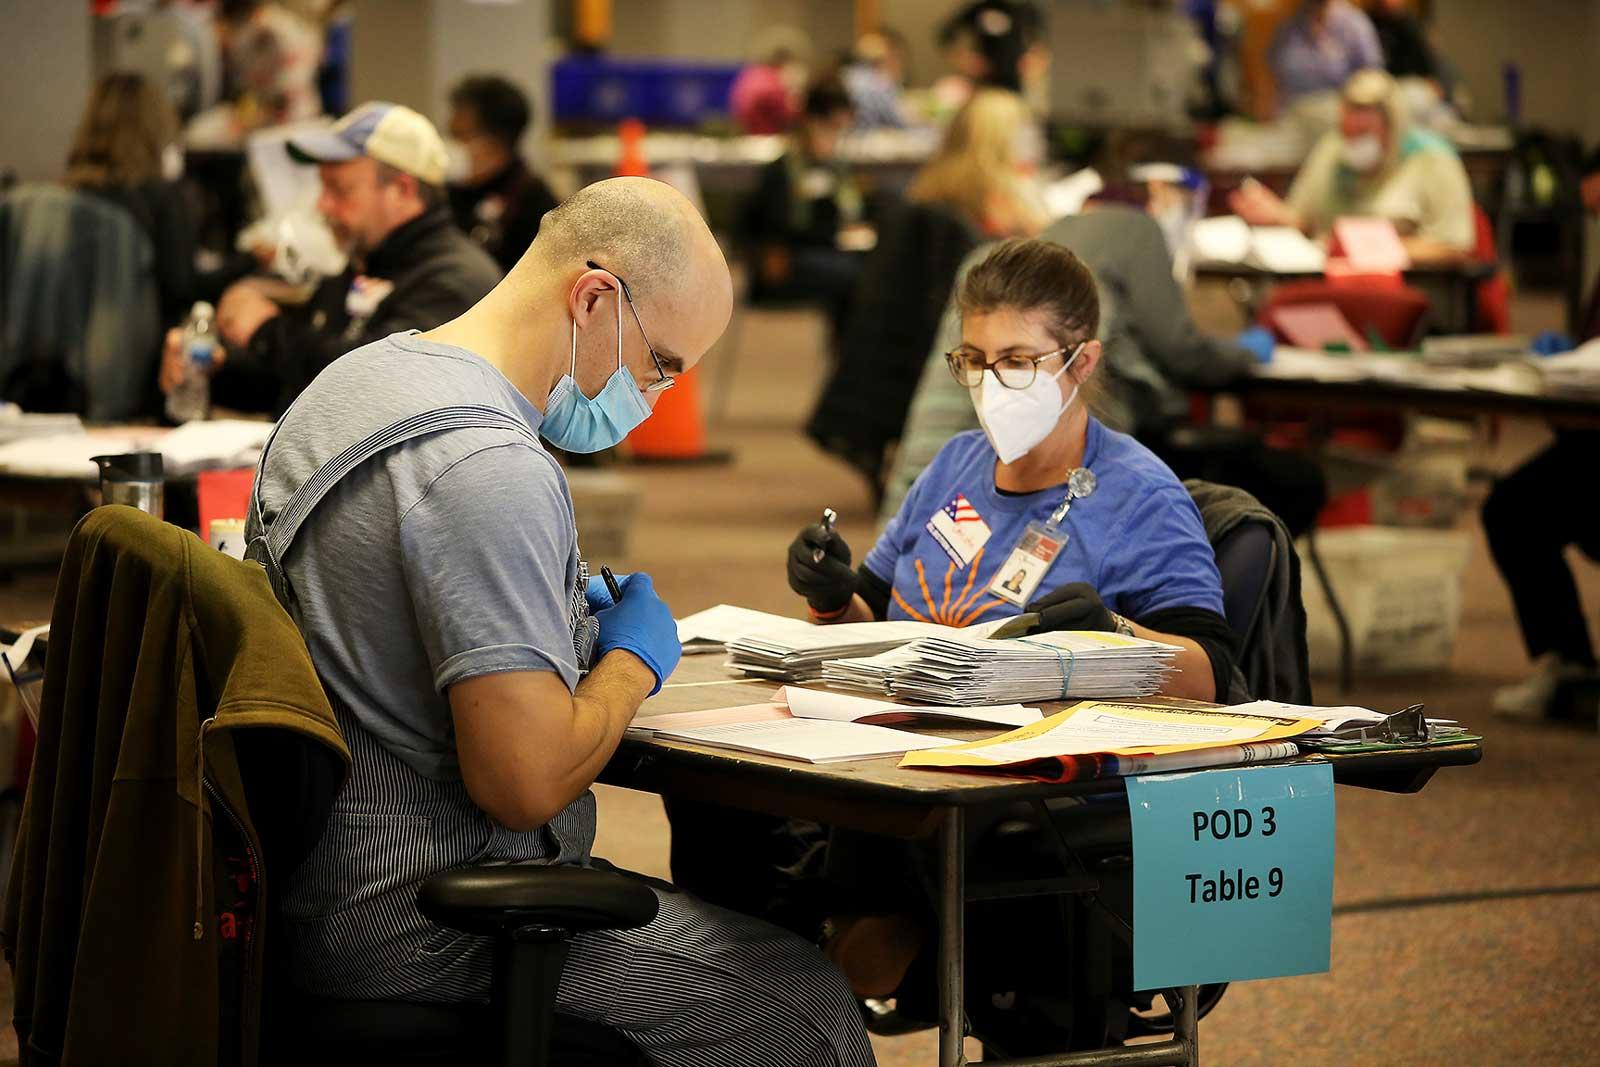 Recuento del voto enviado por correo a Milwaukee, Wisconsin. Fotografía de Pat A. Robinson. ZUMA Wire.